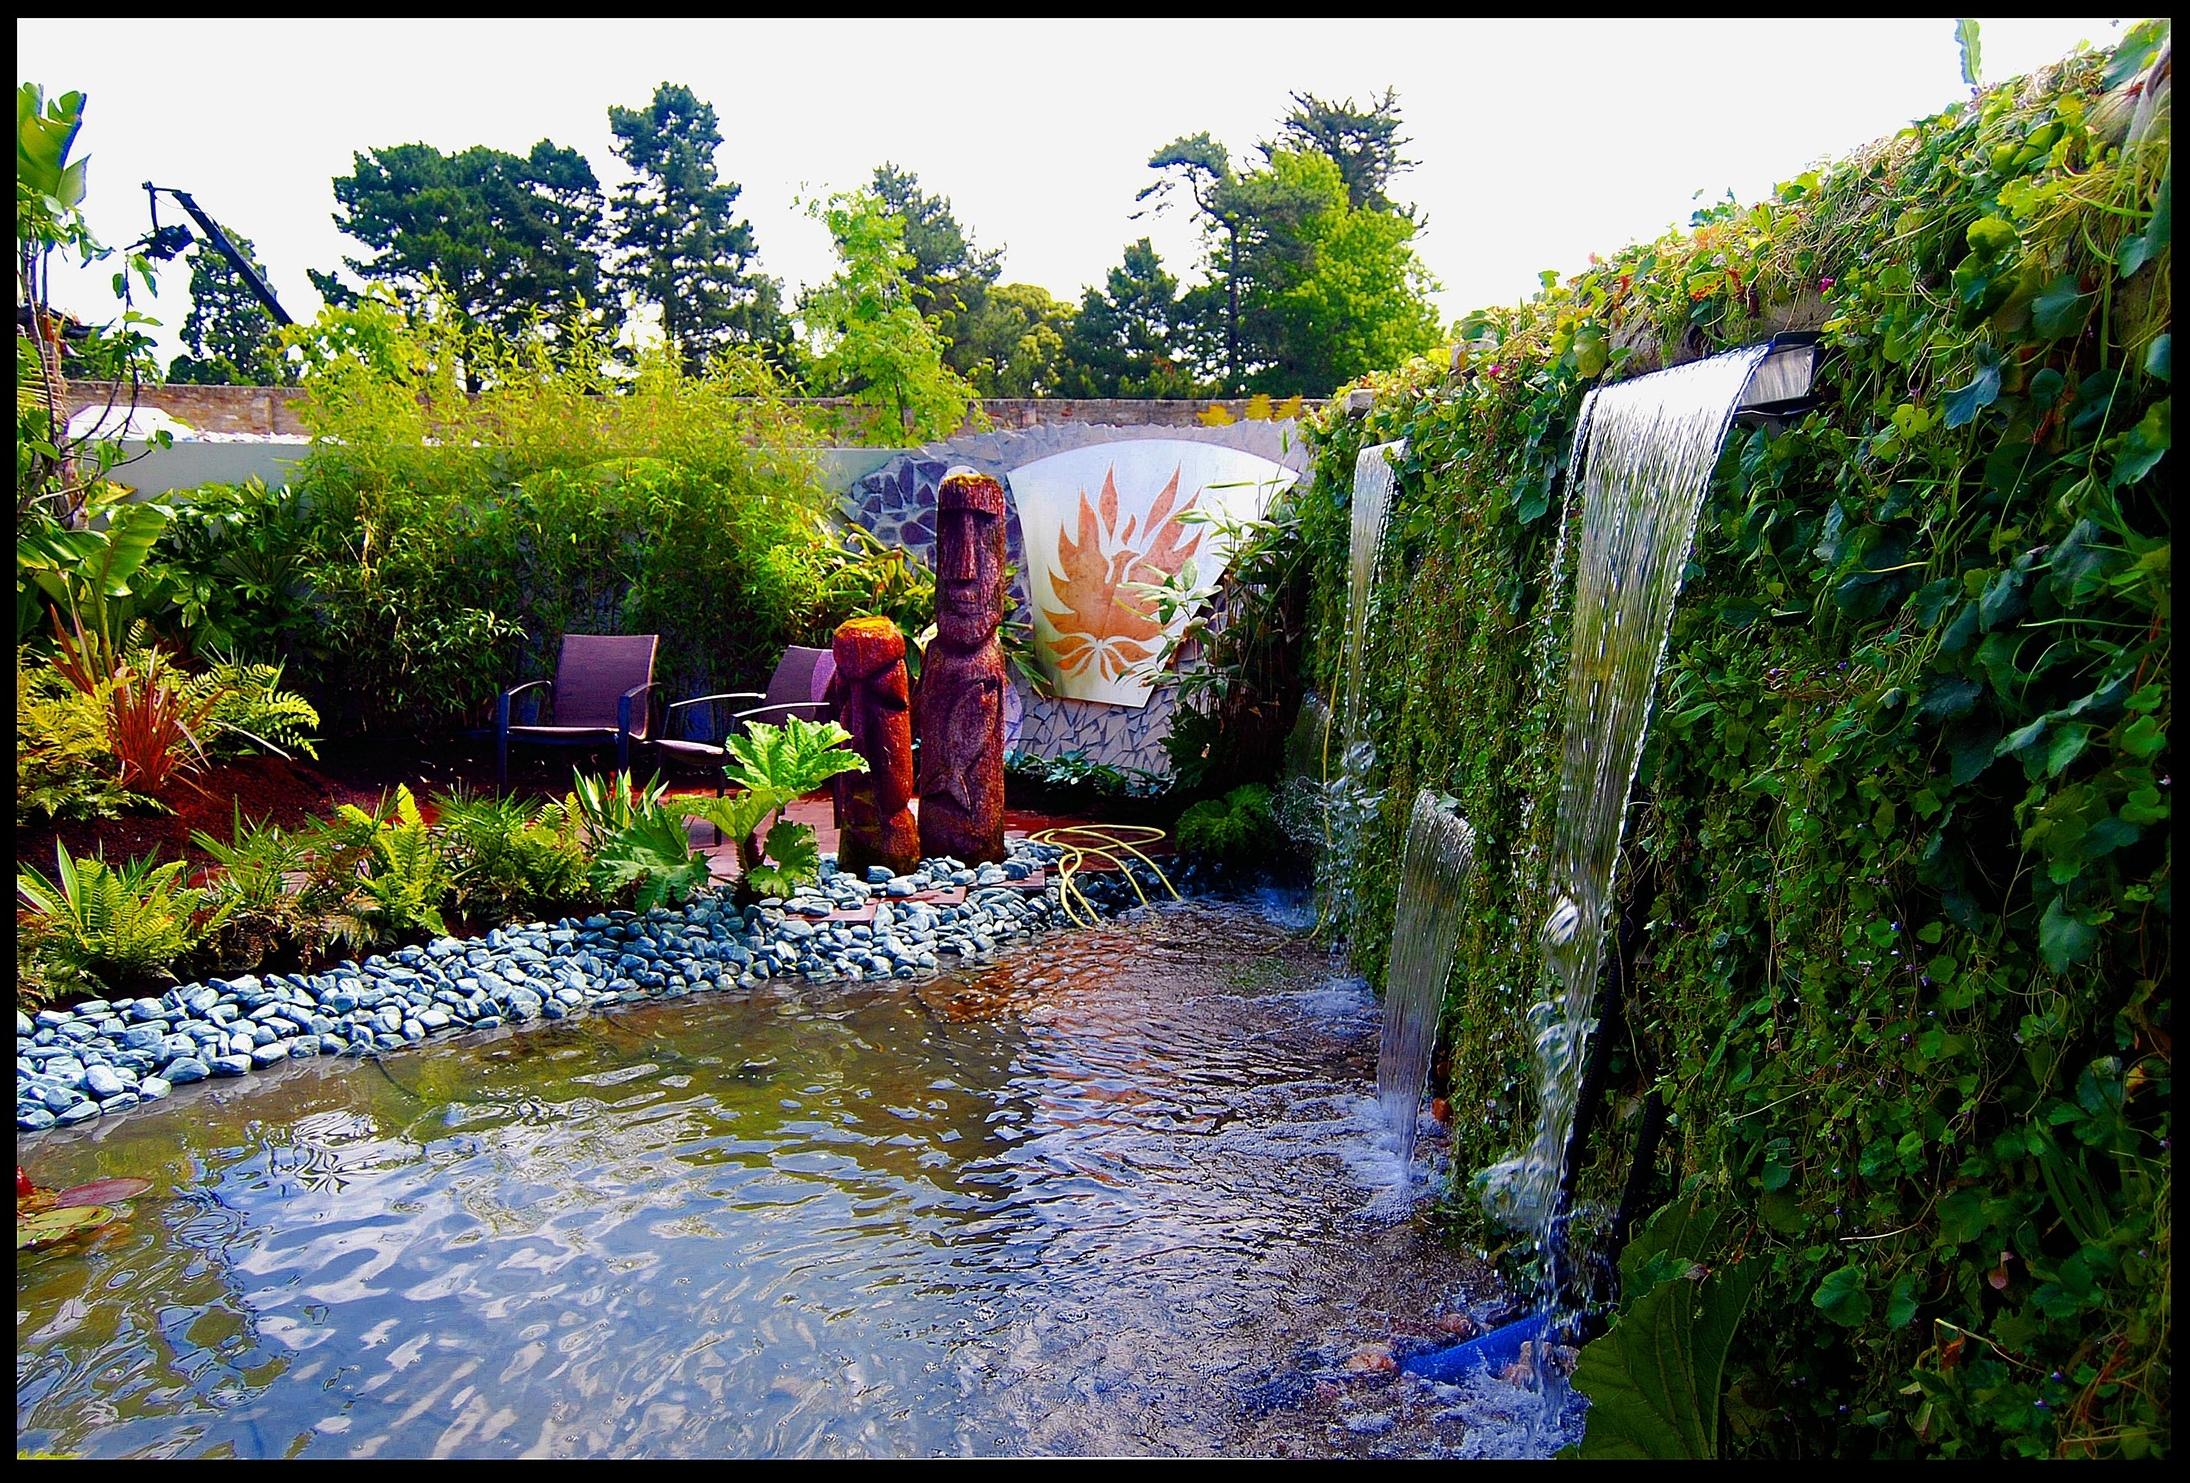 living wall at bloom 'amazonica Floresta' Garden .jpg